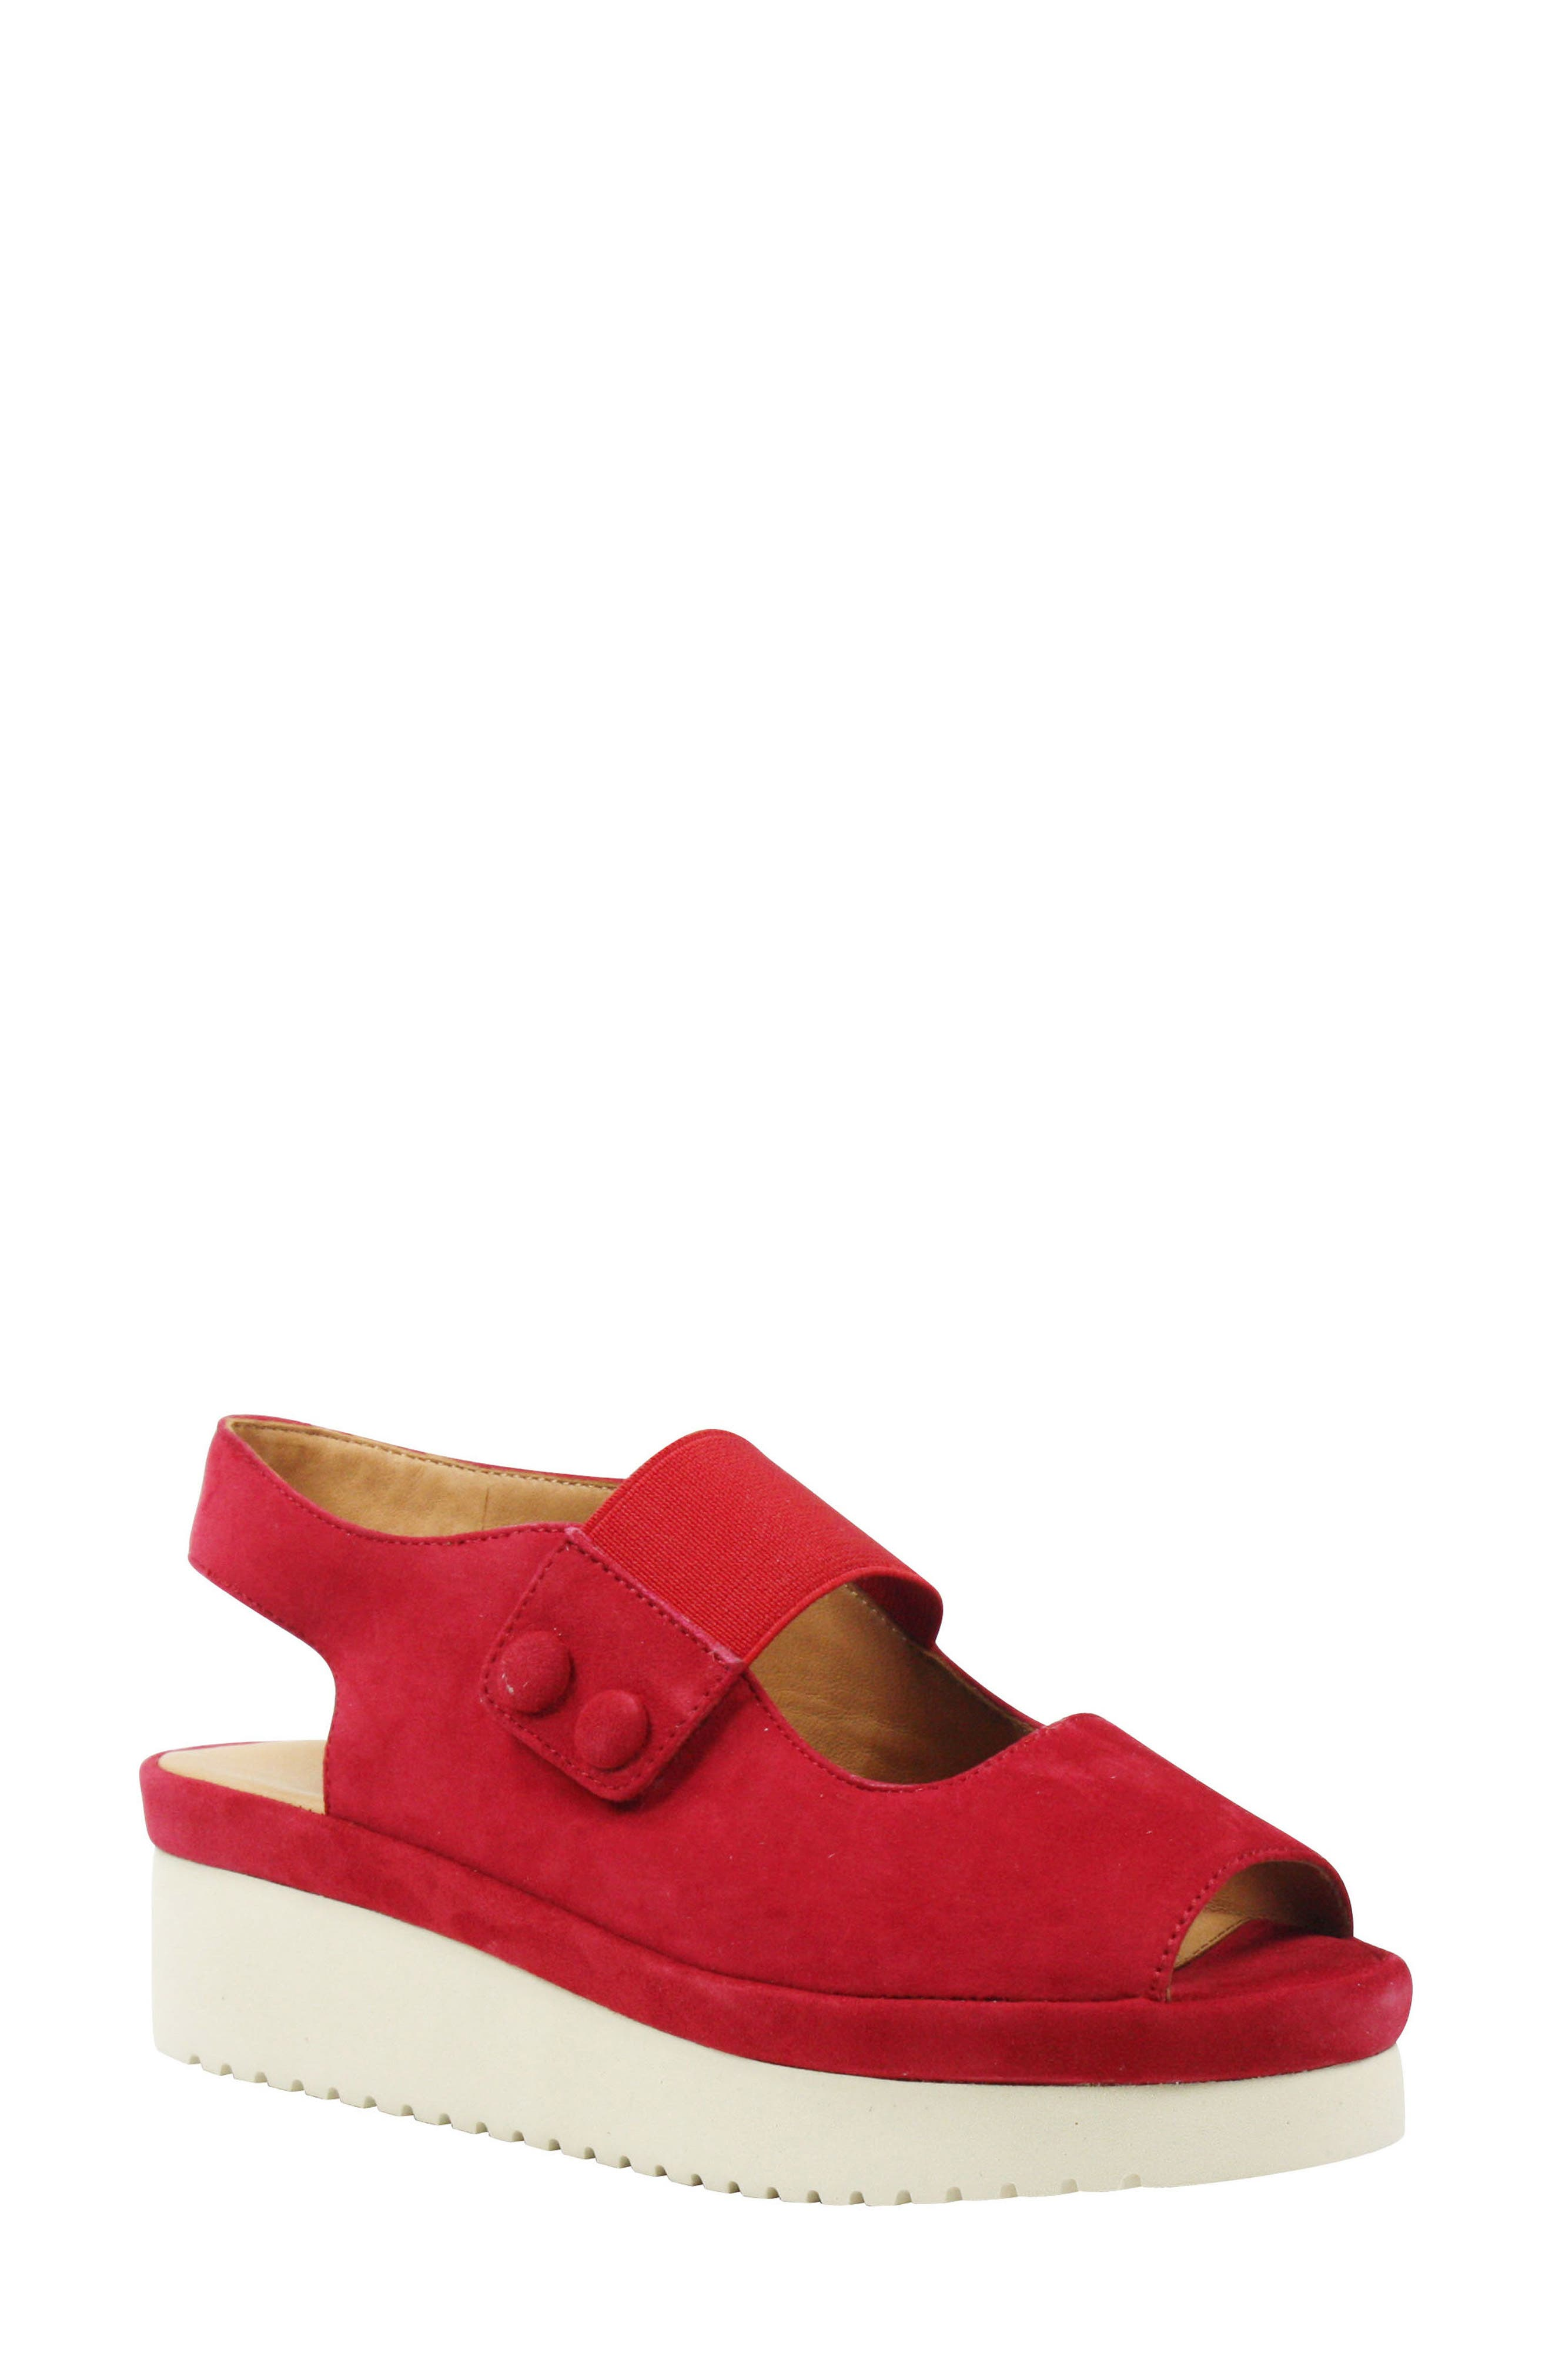 Adalicia Platform Sandal,                         Main,                         color, Bright Red Suede